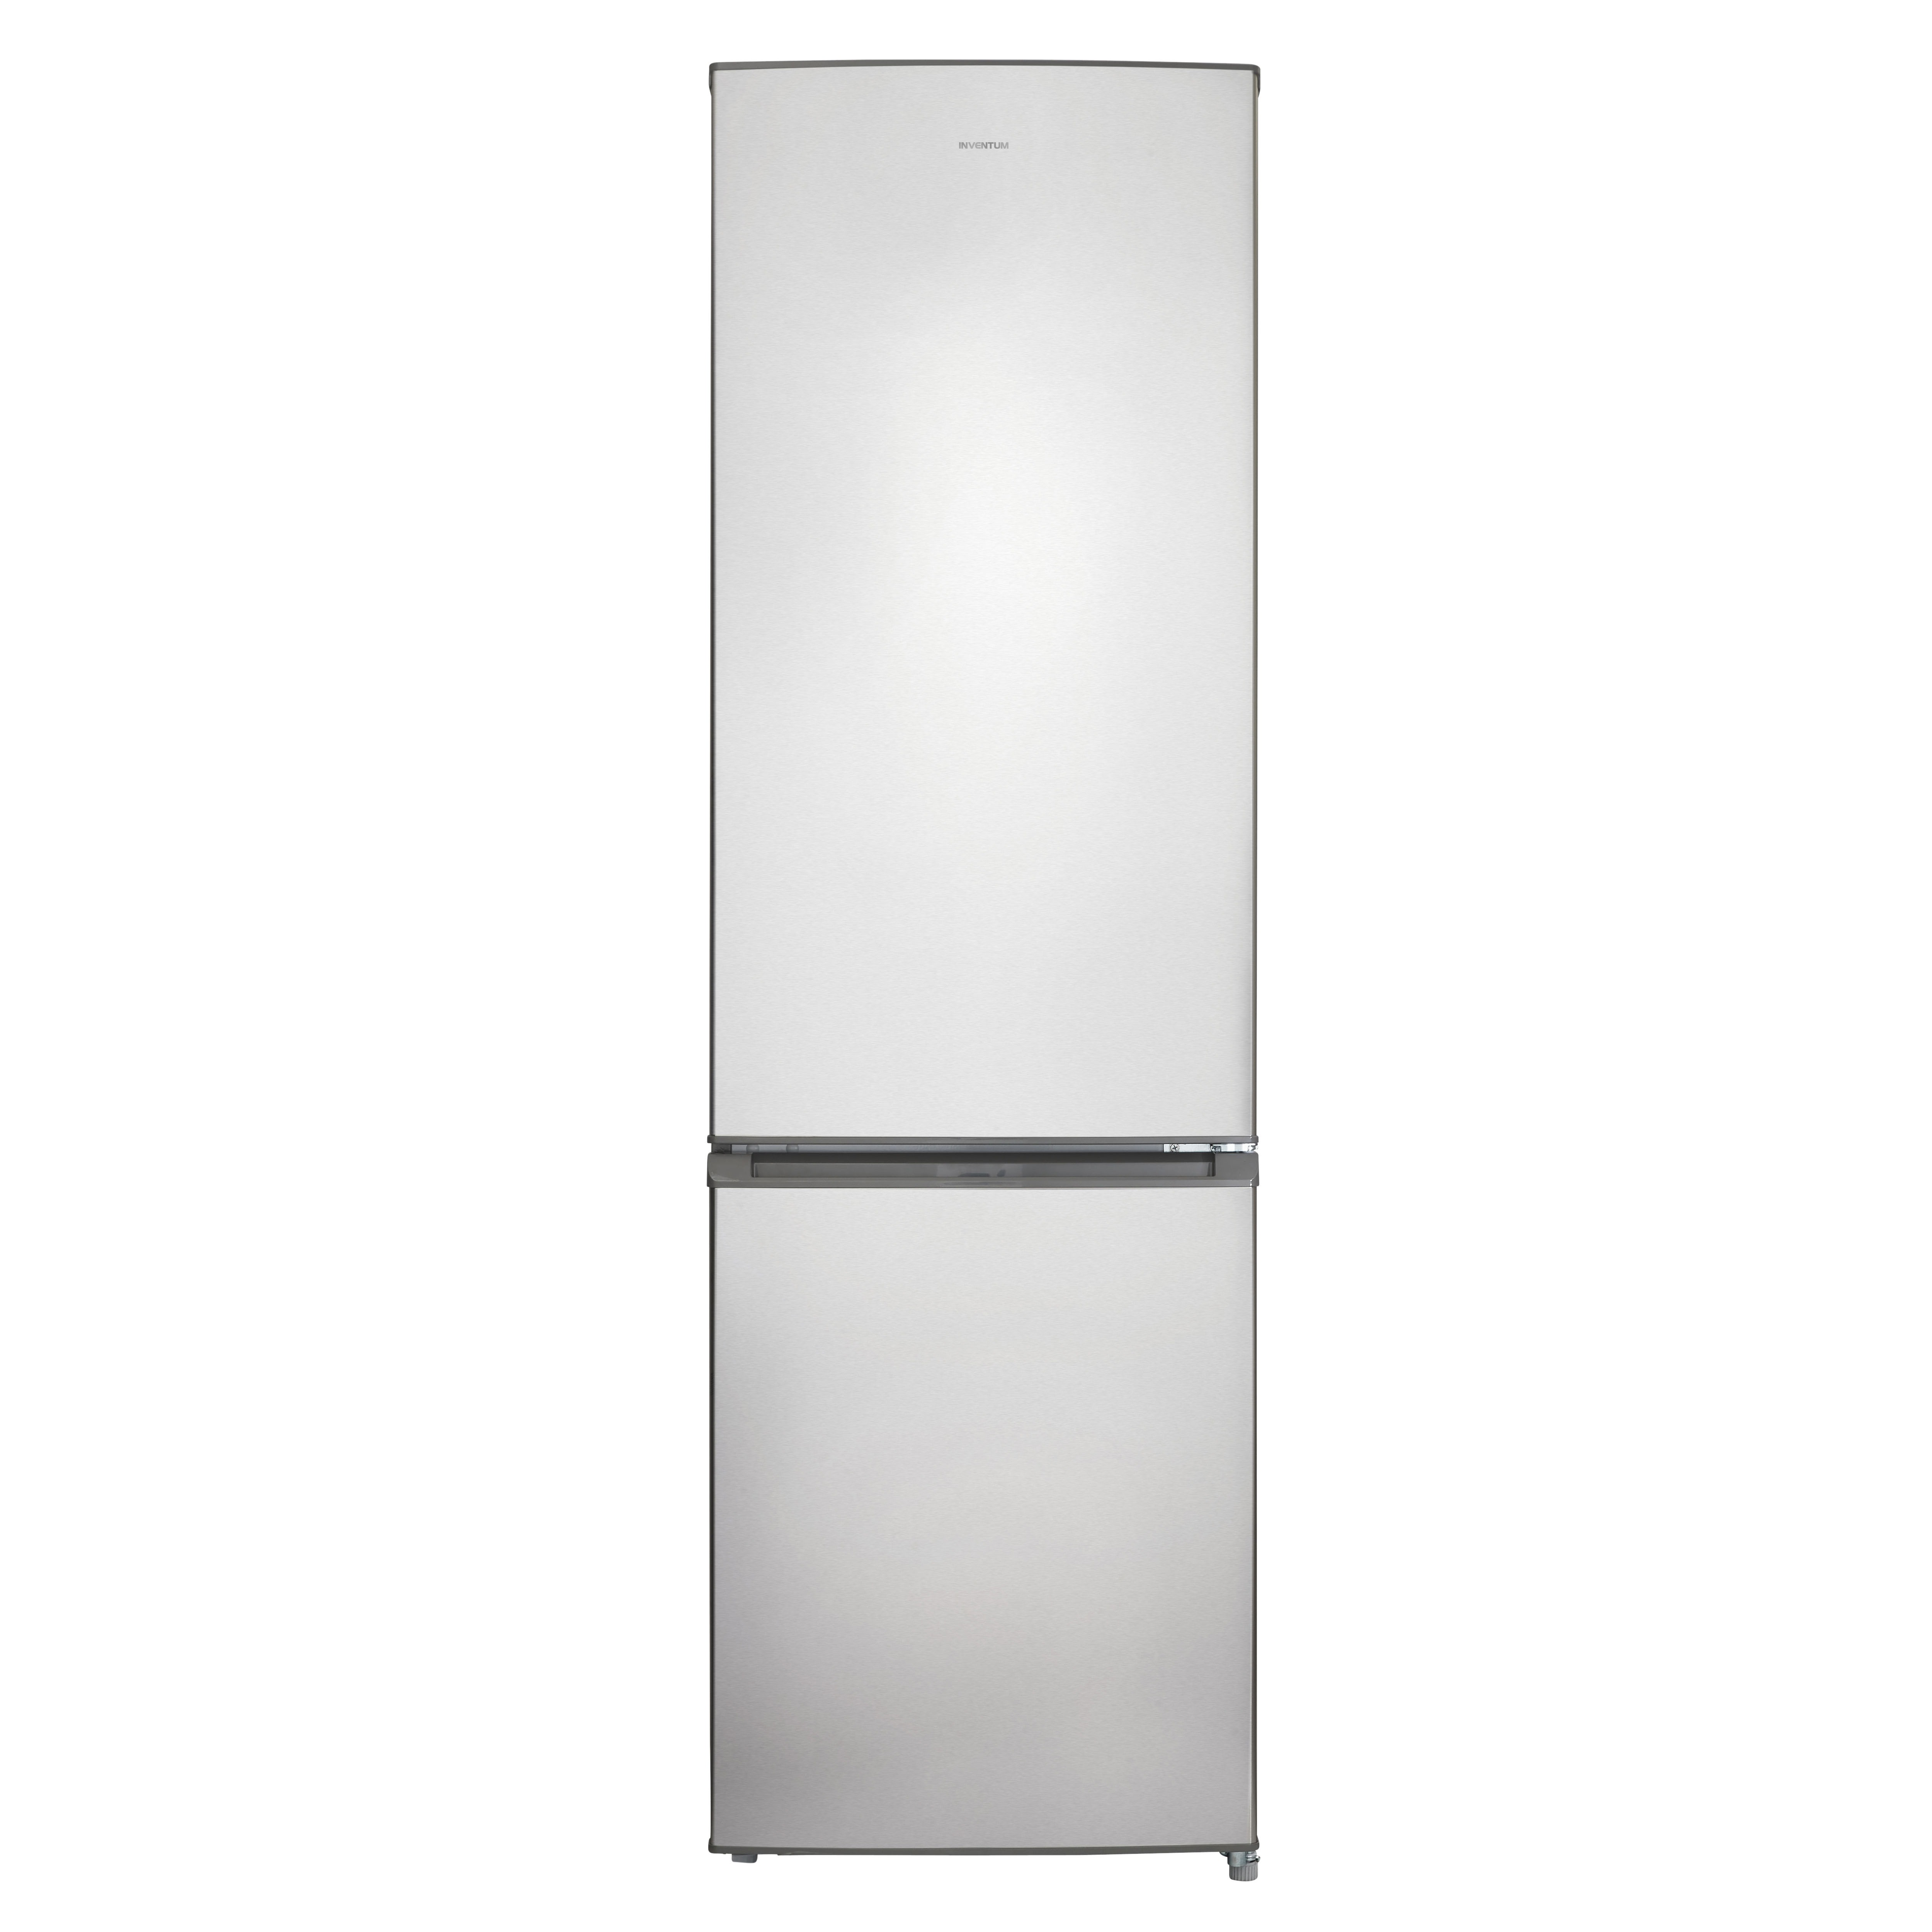 Inventum KV1808R koelkast met vriesvak